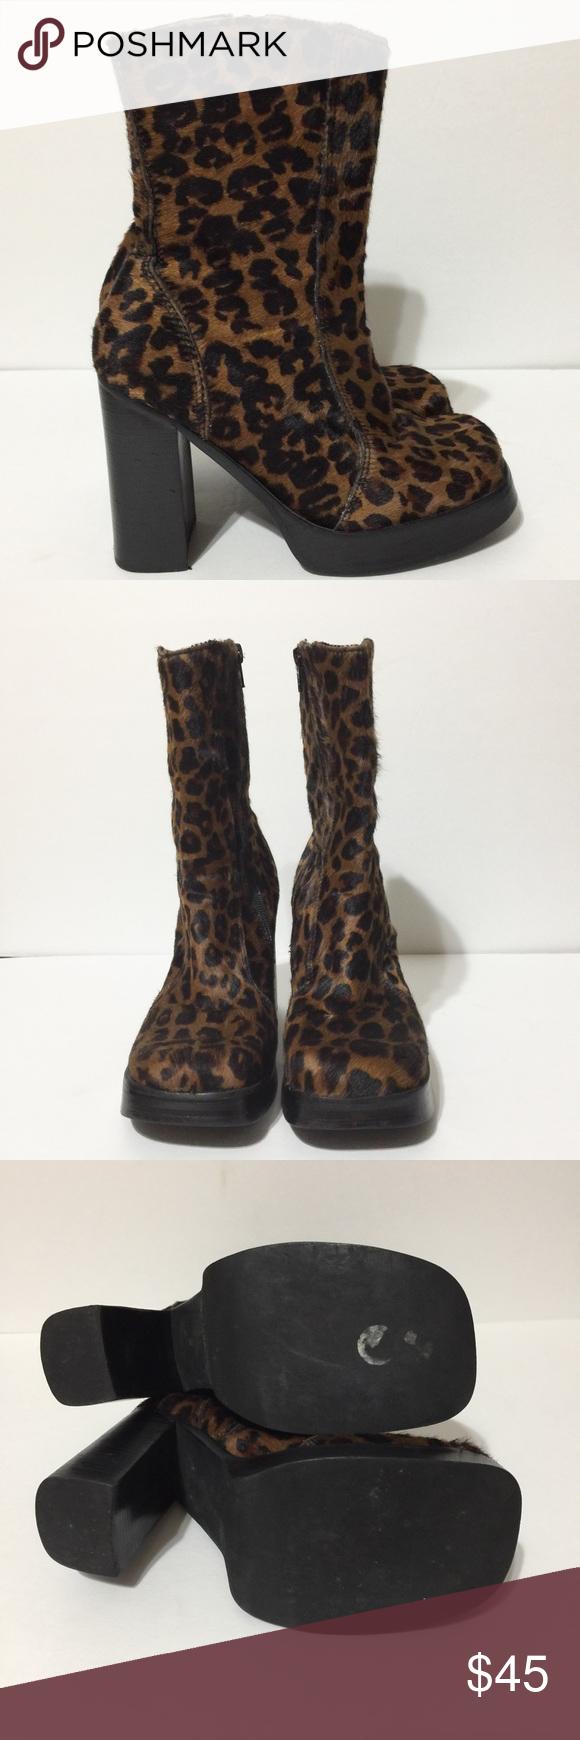 d0c719888e2 STEVE MADDEN 'WAYNE' BOOTS Like new! Steve Madden Shoes Ankle Boots ...